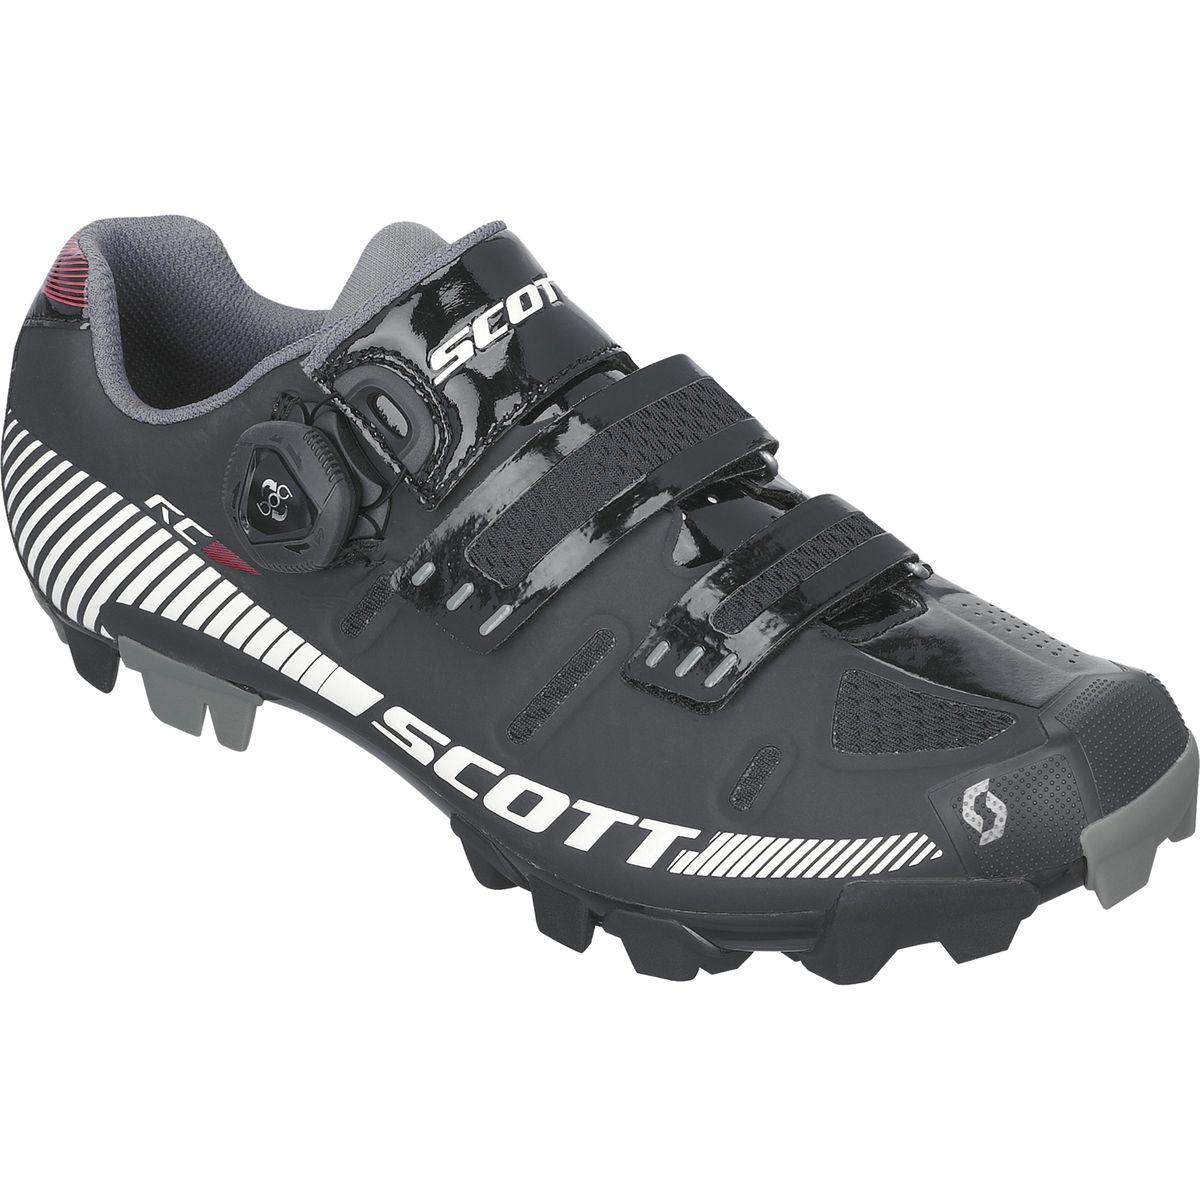 Scott MTB RC Lady Shoe - Women's